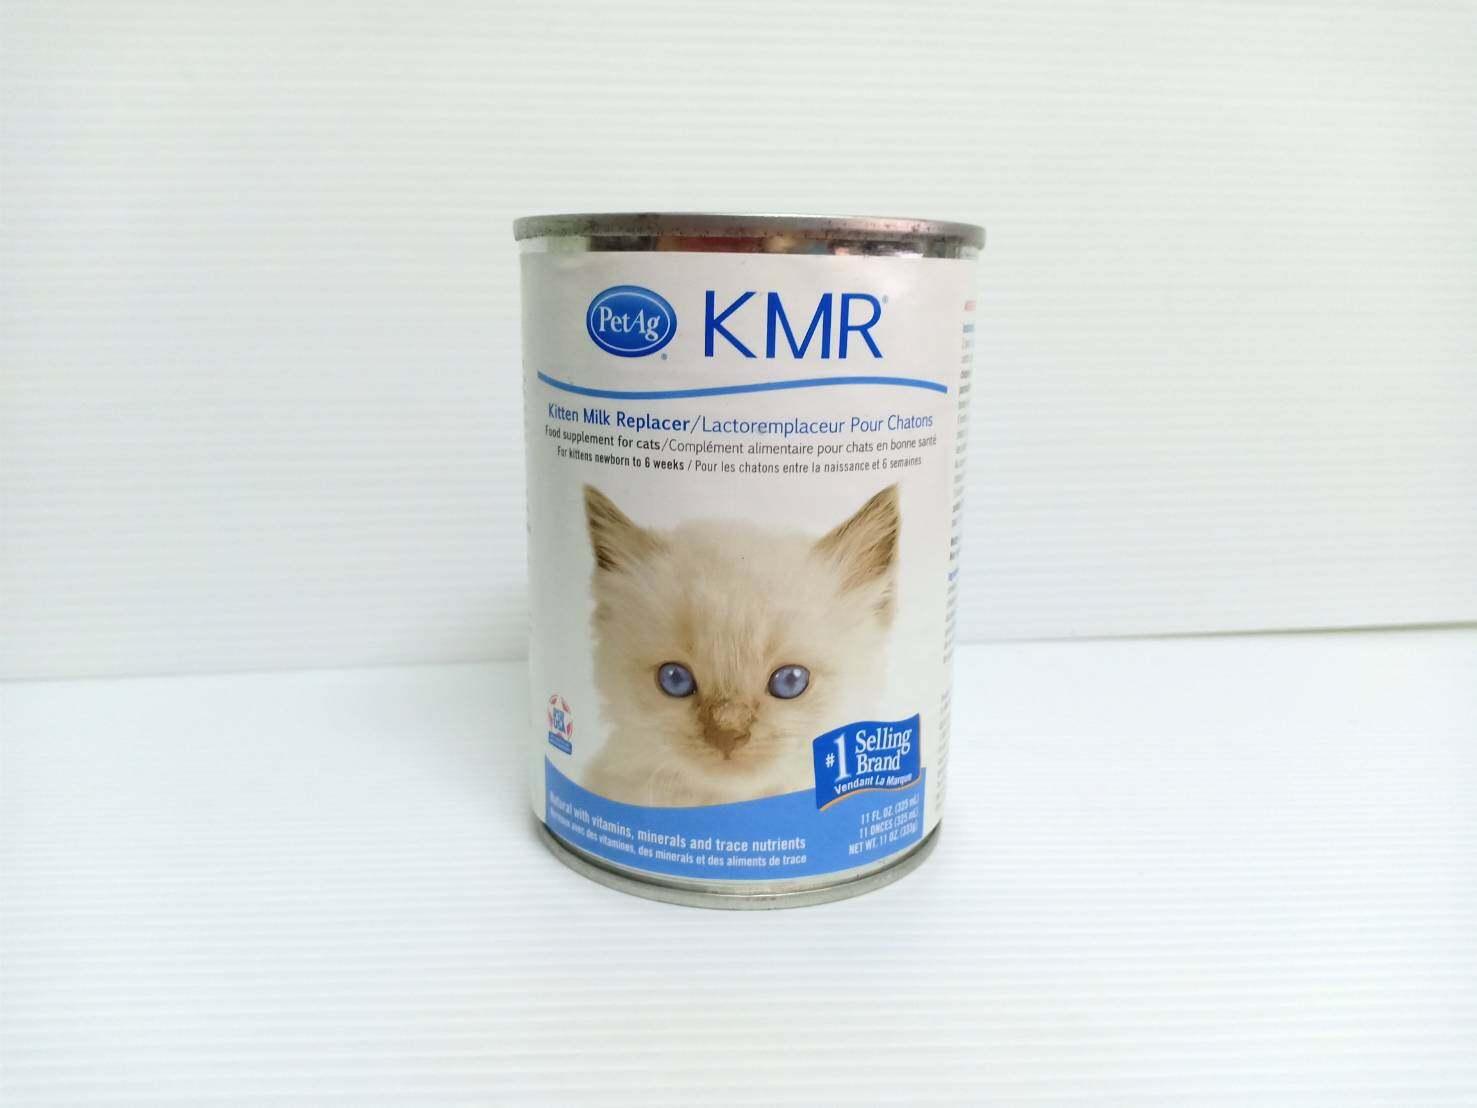 Kmr - นมน้ำลูกแมว แรกเกิด ขนาด 11 Fl. Oz. (325 Ml).